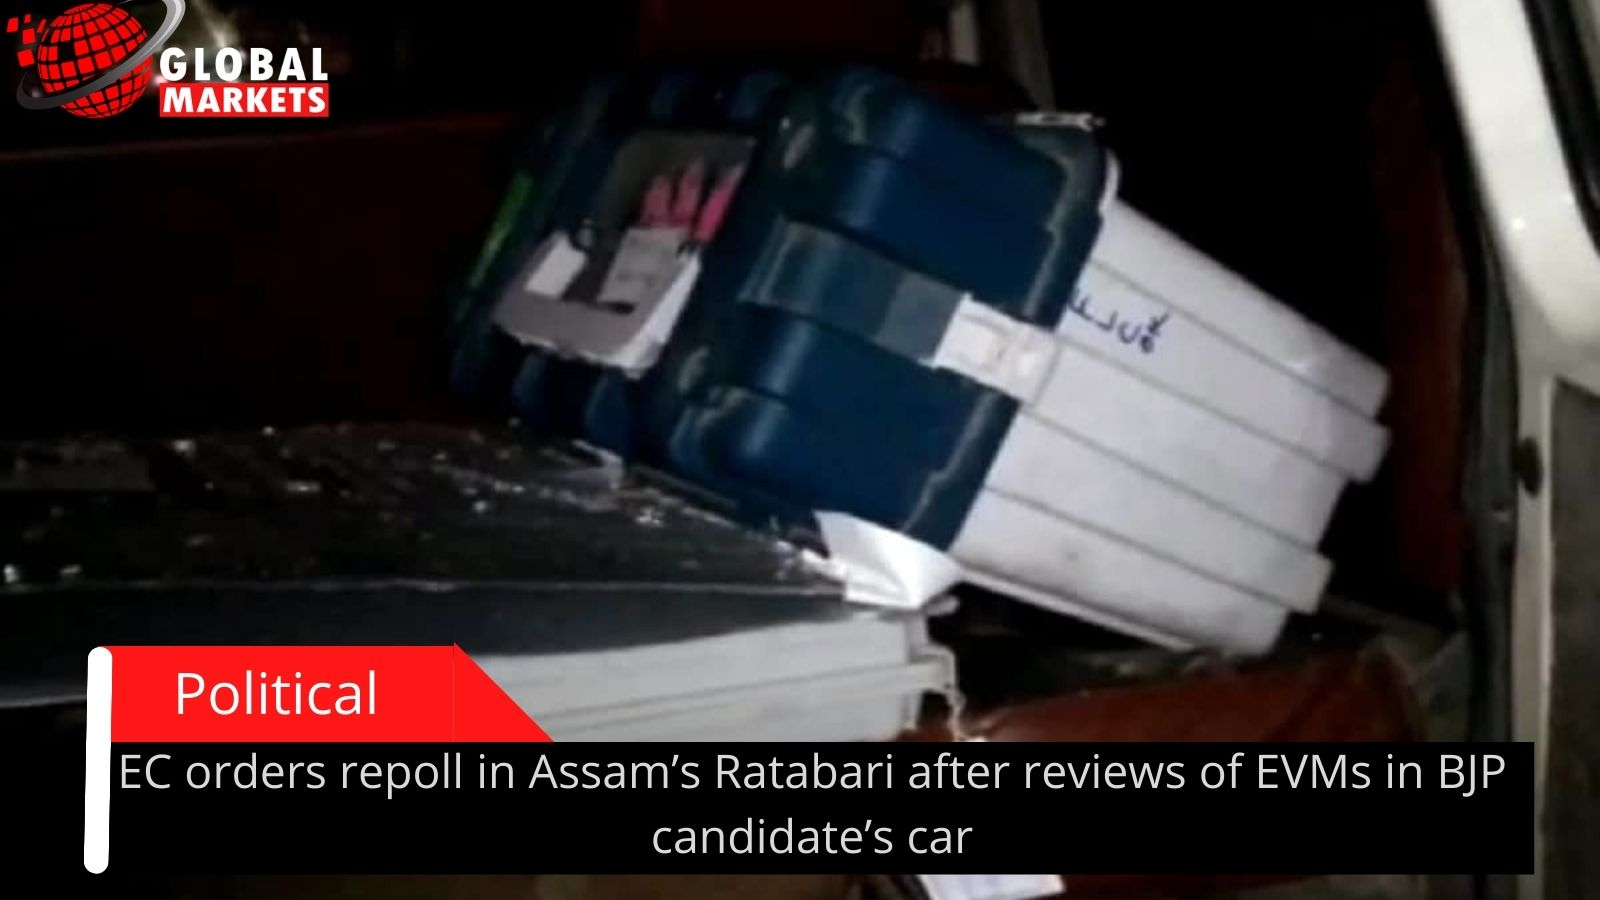 EC orders repoll in Assam's Ratabari after reviews of EVMs in BJP candidate's car